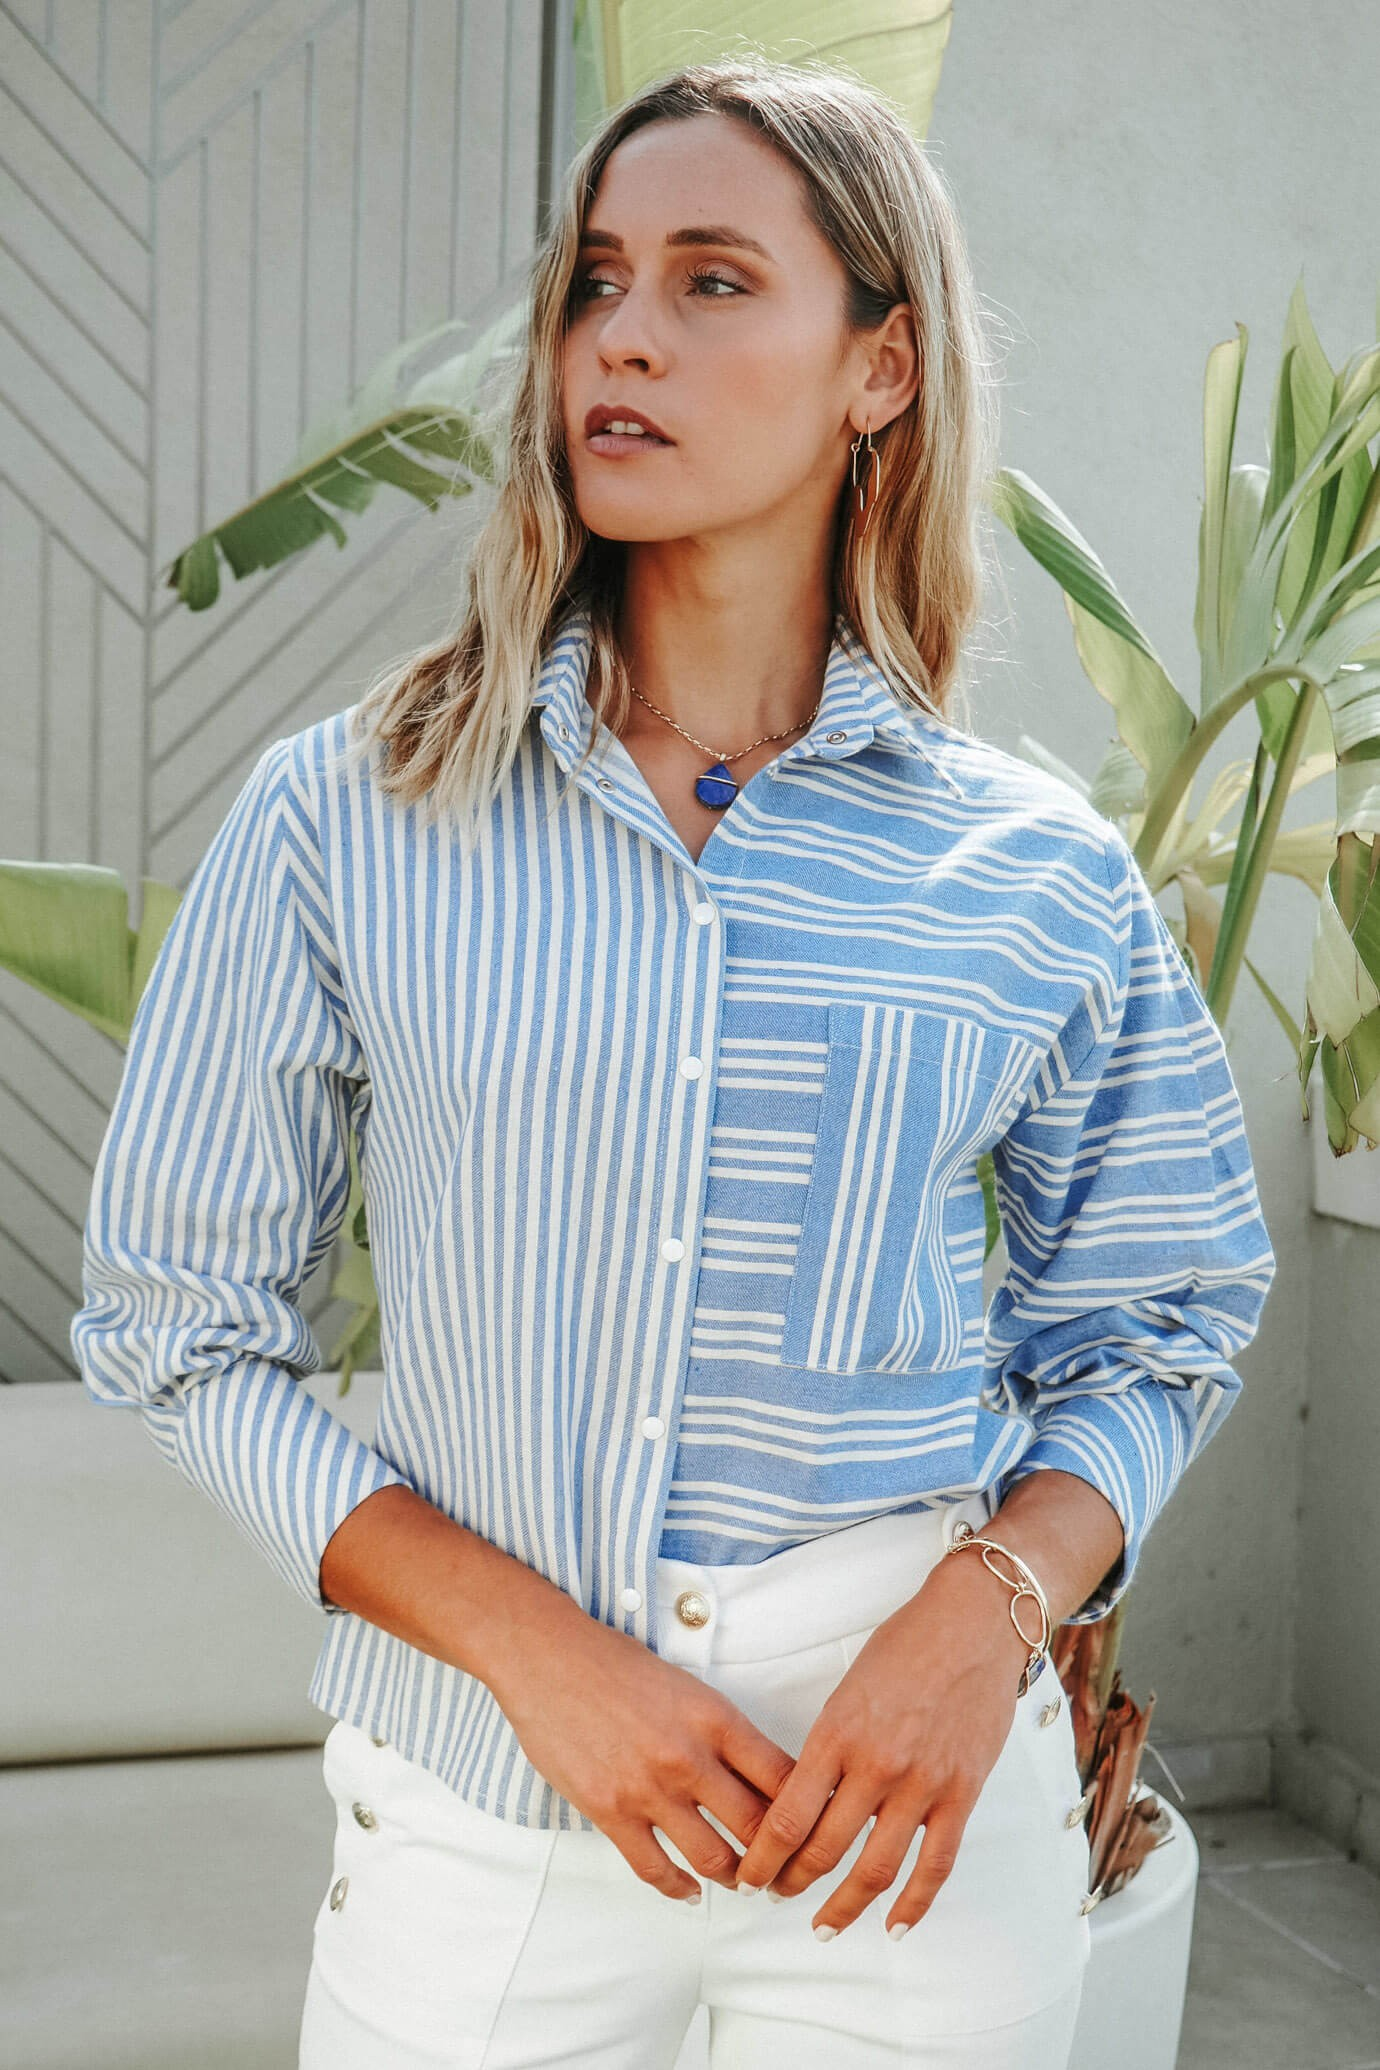 Chemise à rayures horizontales et verticales 2